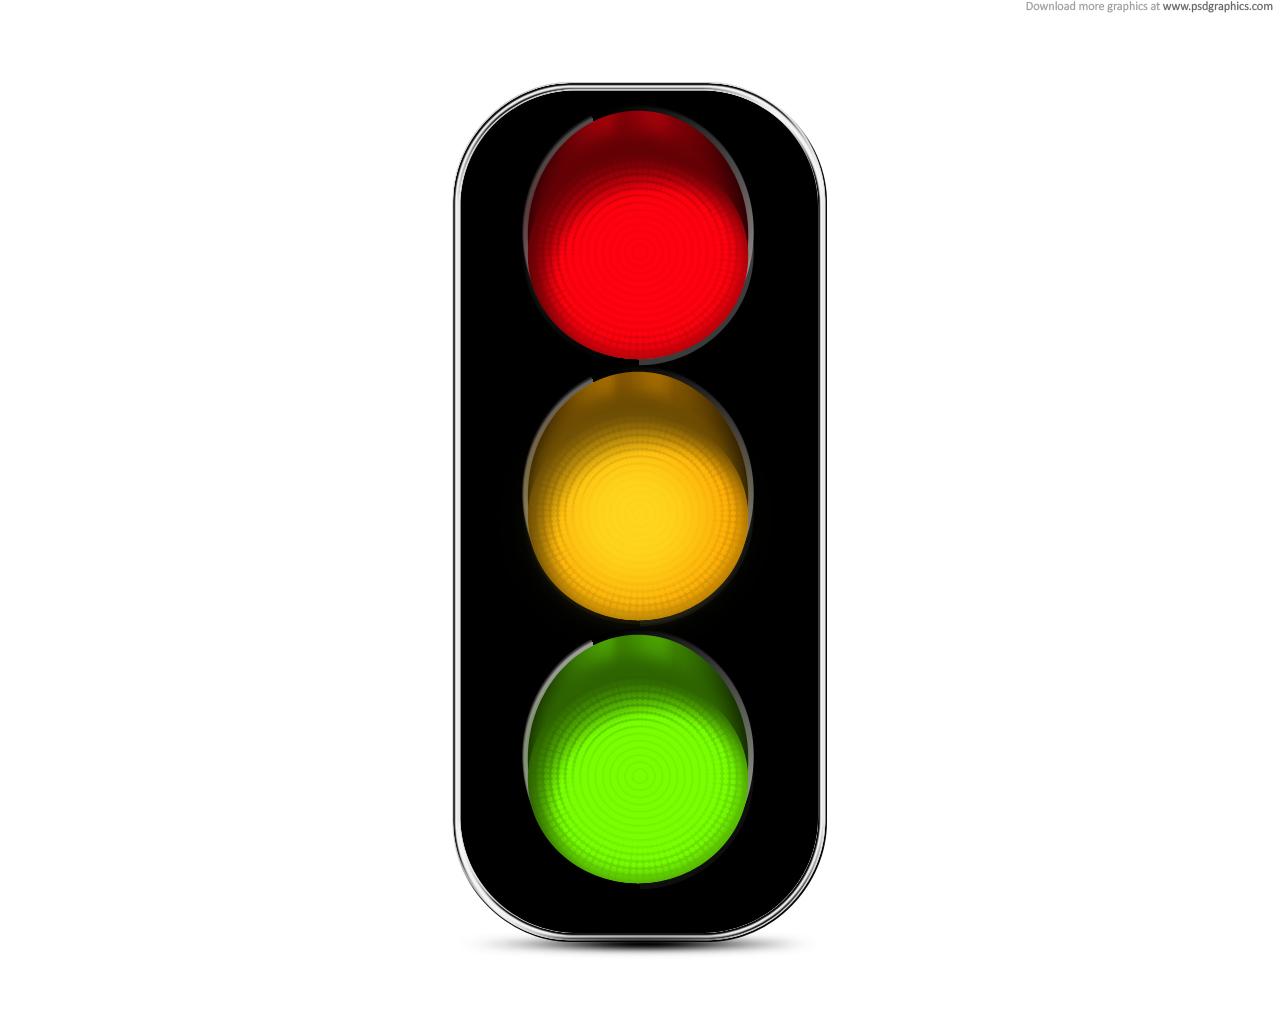 red stop light clipart clipart suggest lip clip art cricut lip clip art coloring